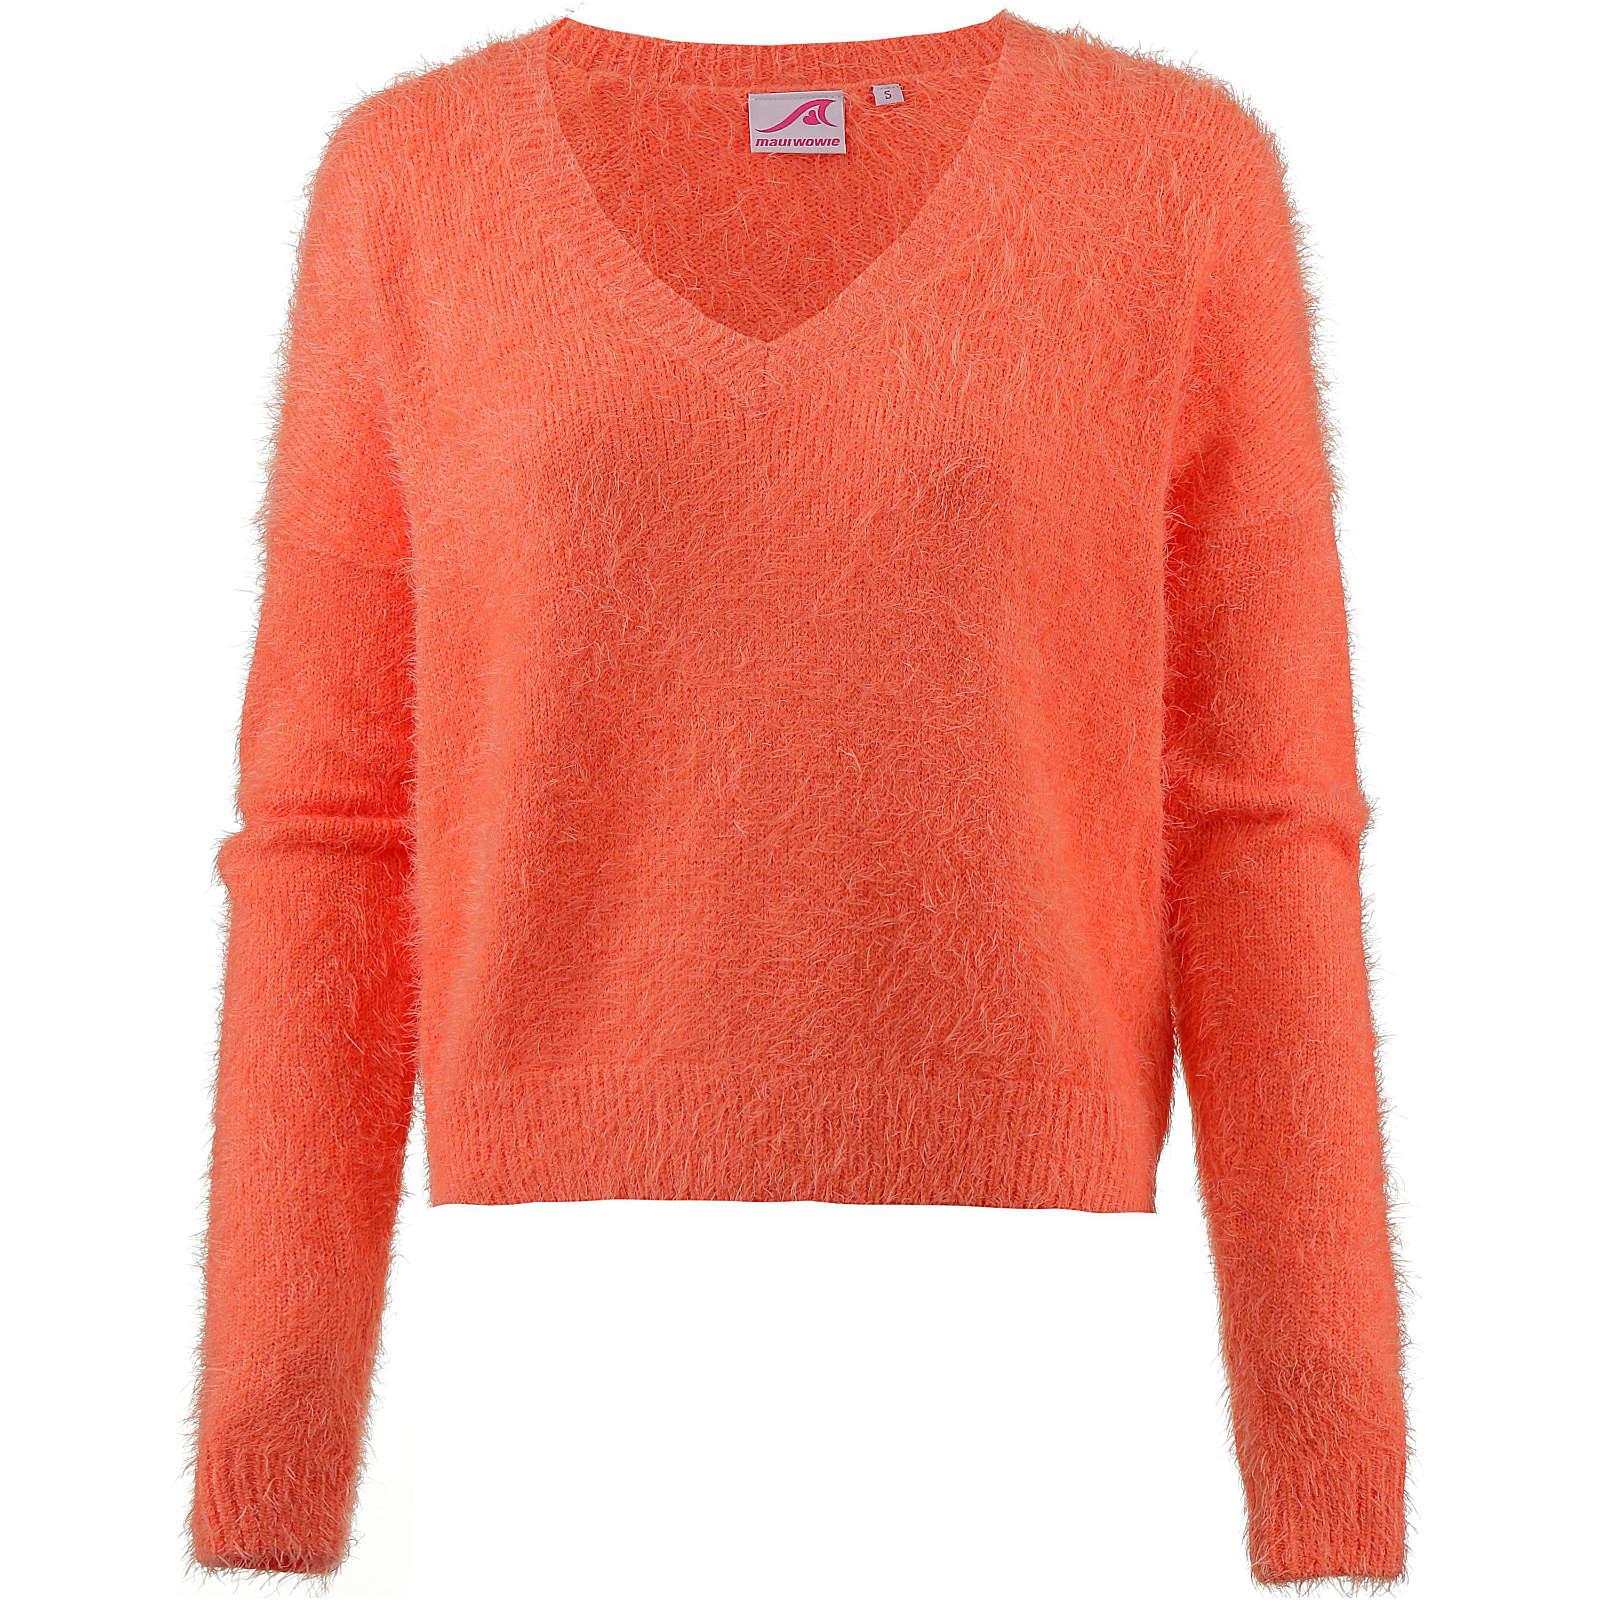 Maui Wowie V-Pullover Pullover orange Damen Gr. 36